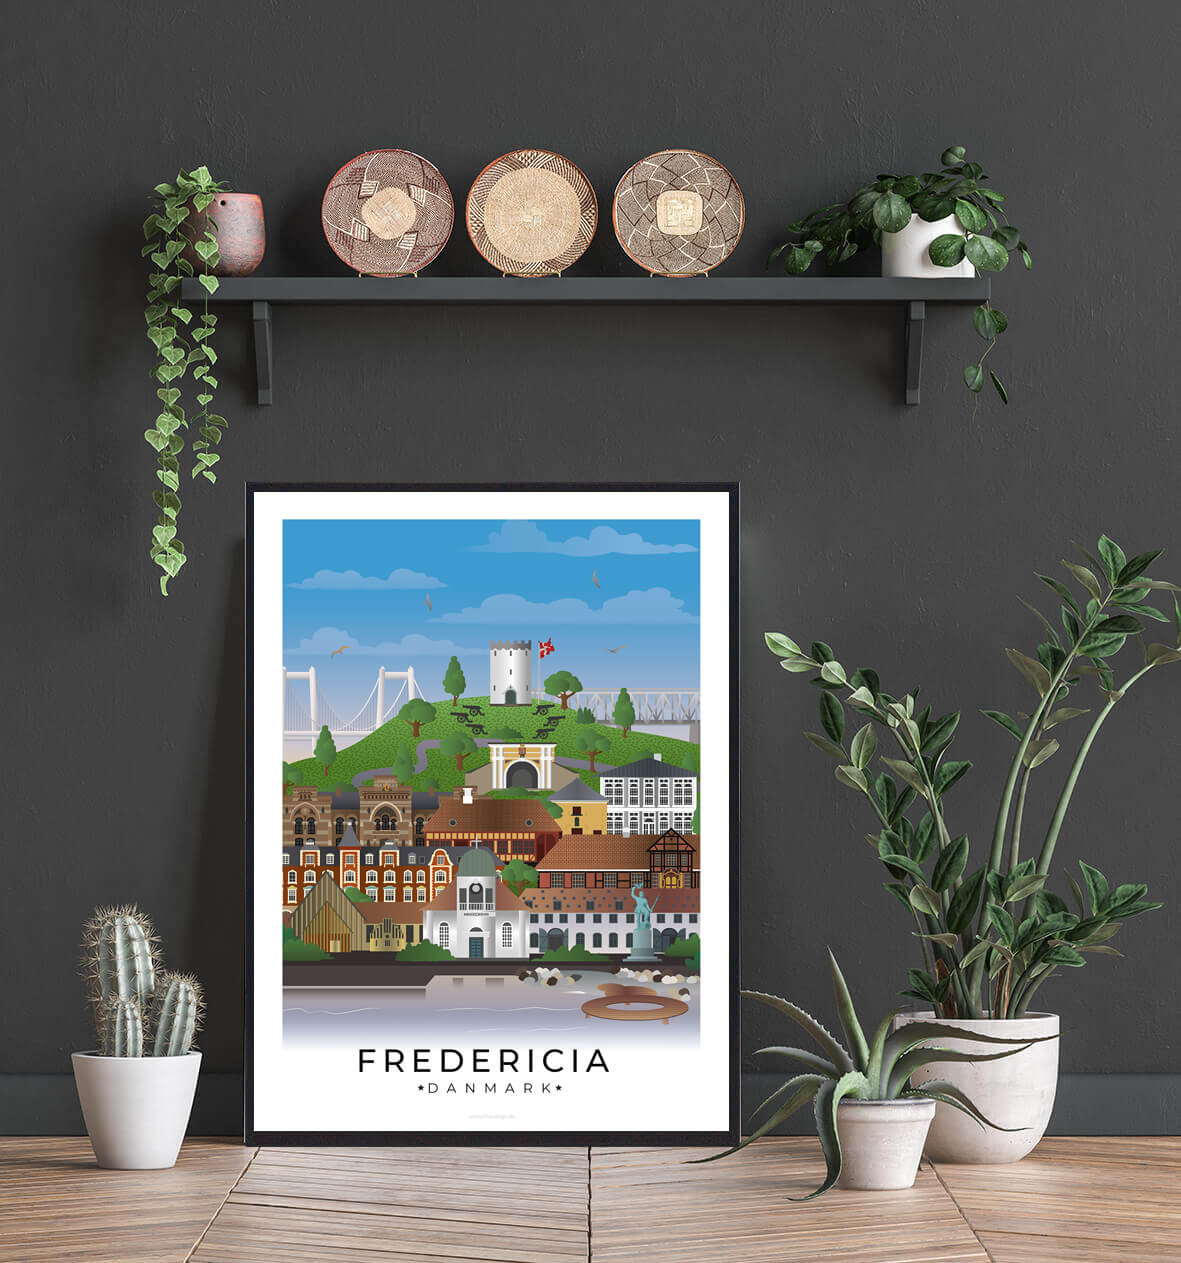 Fredericia-byplakat-2